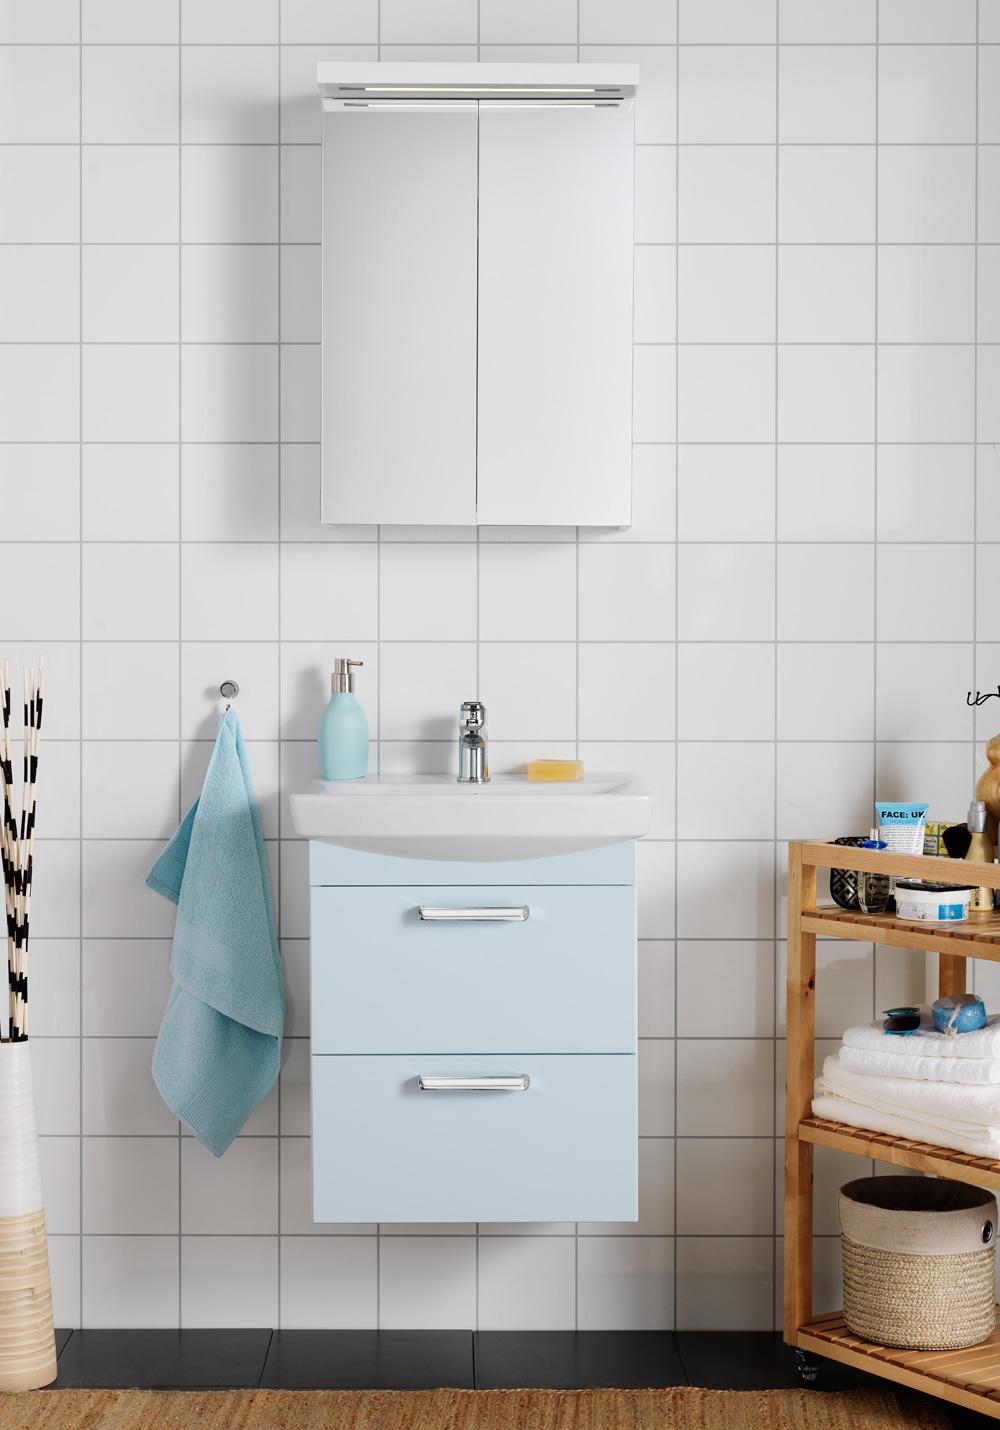 LIFE 500 KOMPL M SPEGELSKÅP VIT - Hafa badrum